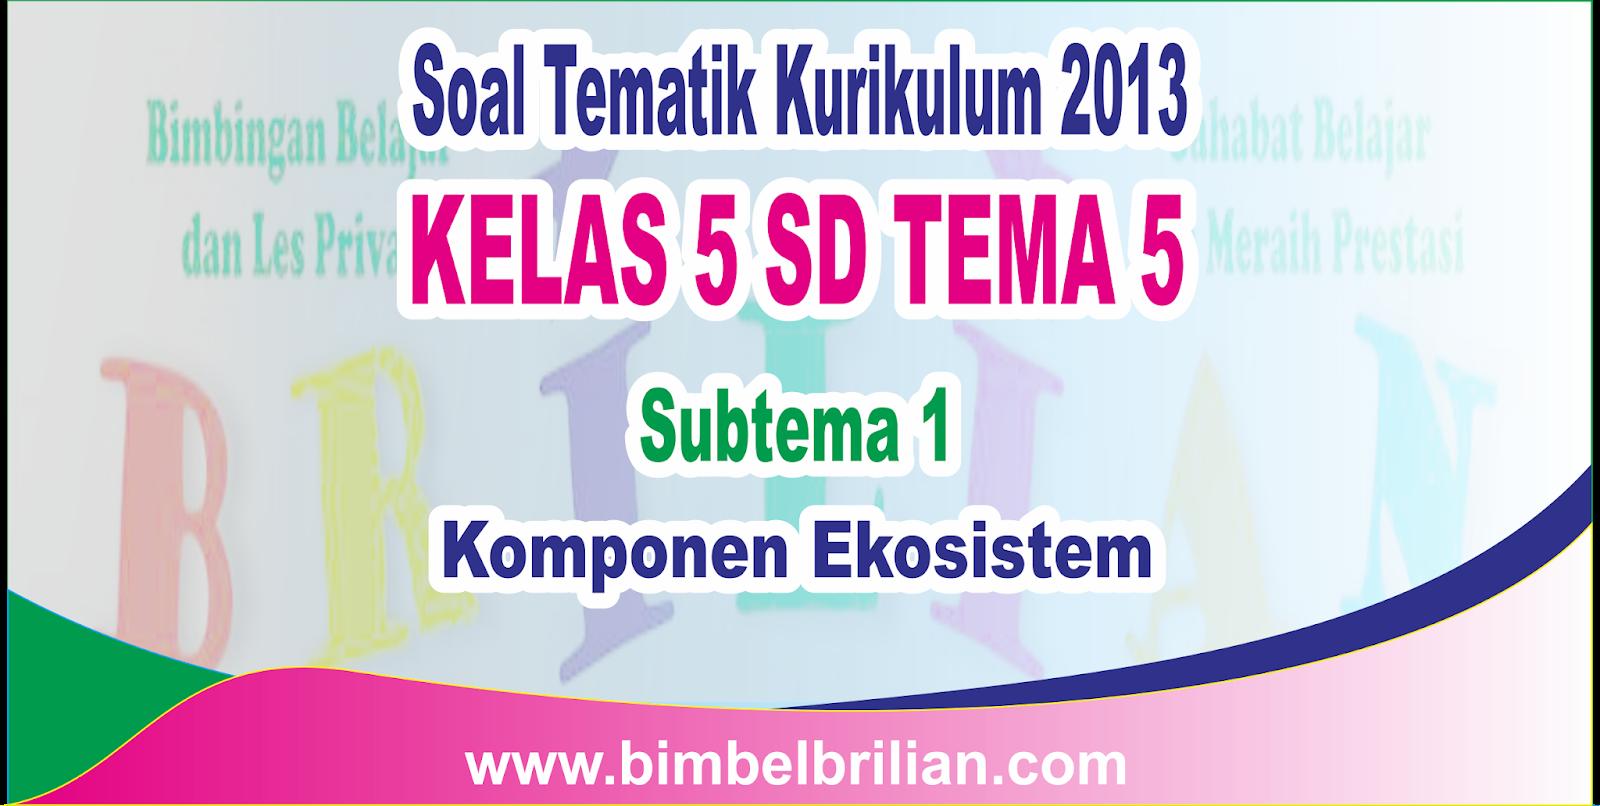 Download Soal Tematik Kelas 5 SD Tema 5 Subtema 1 Komponen ...